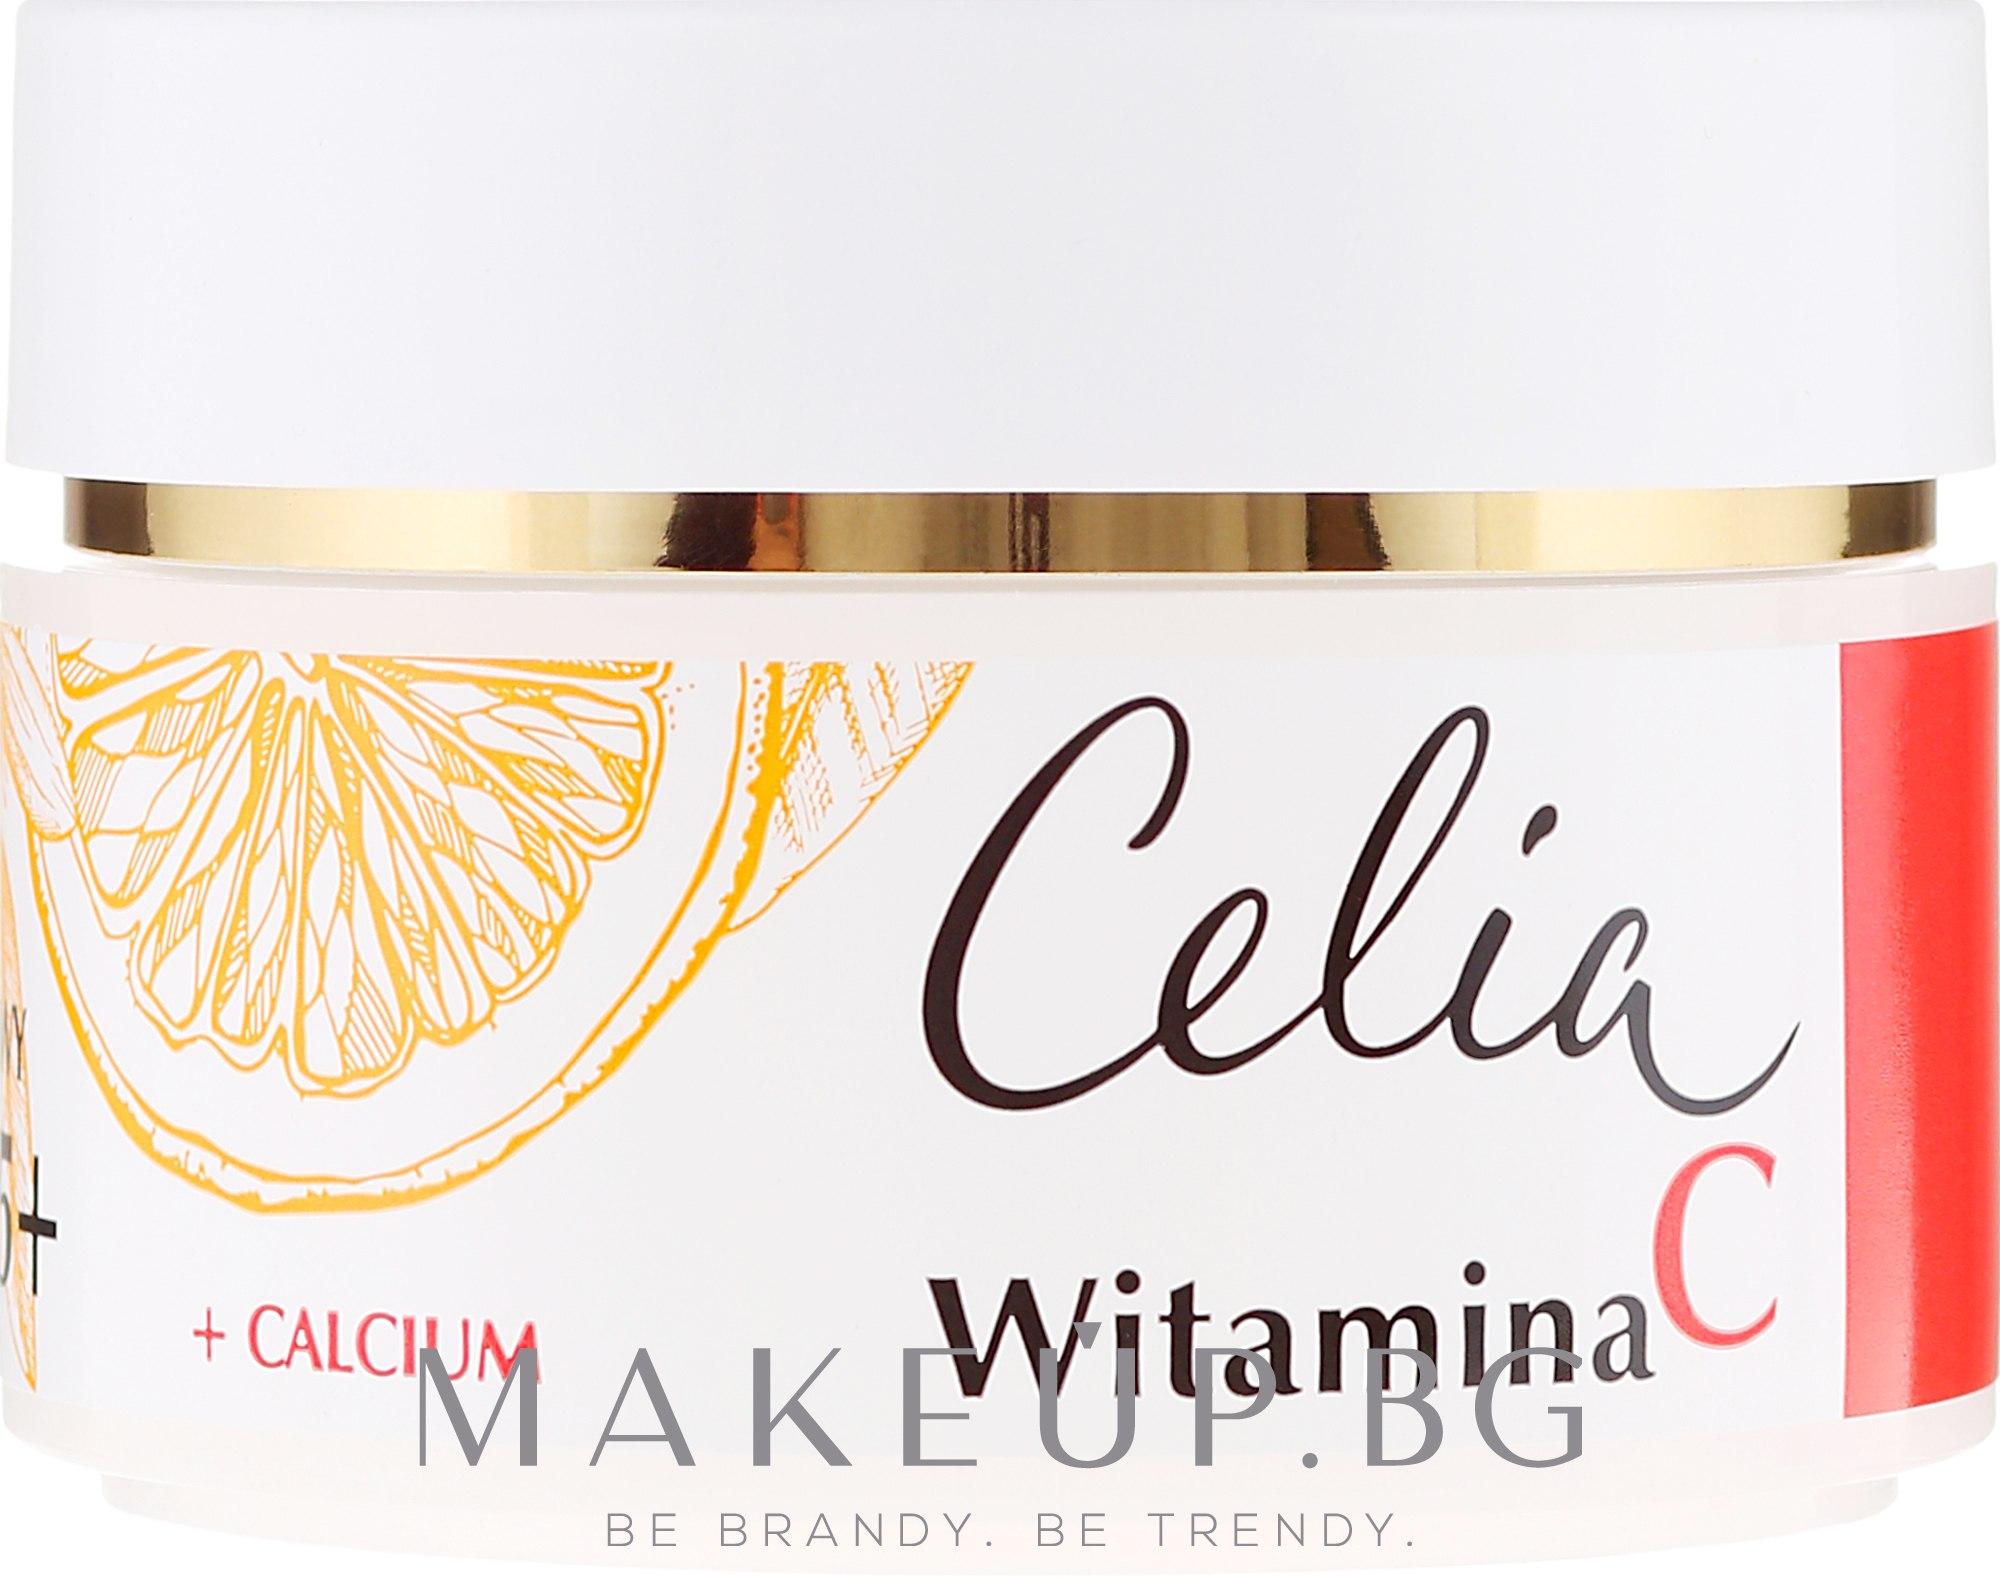 MAKEUP - Celia Witamina C - Дневен и нощен крем за лице..